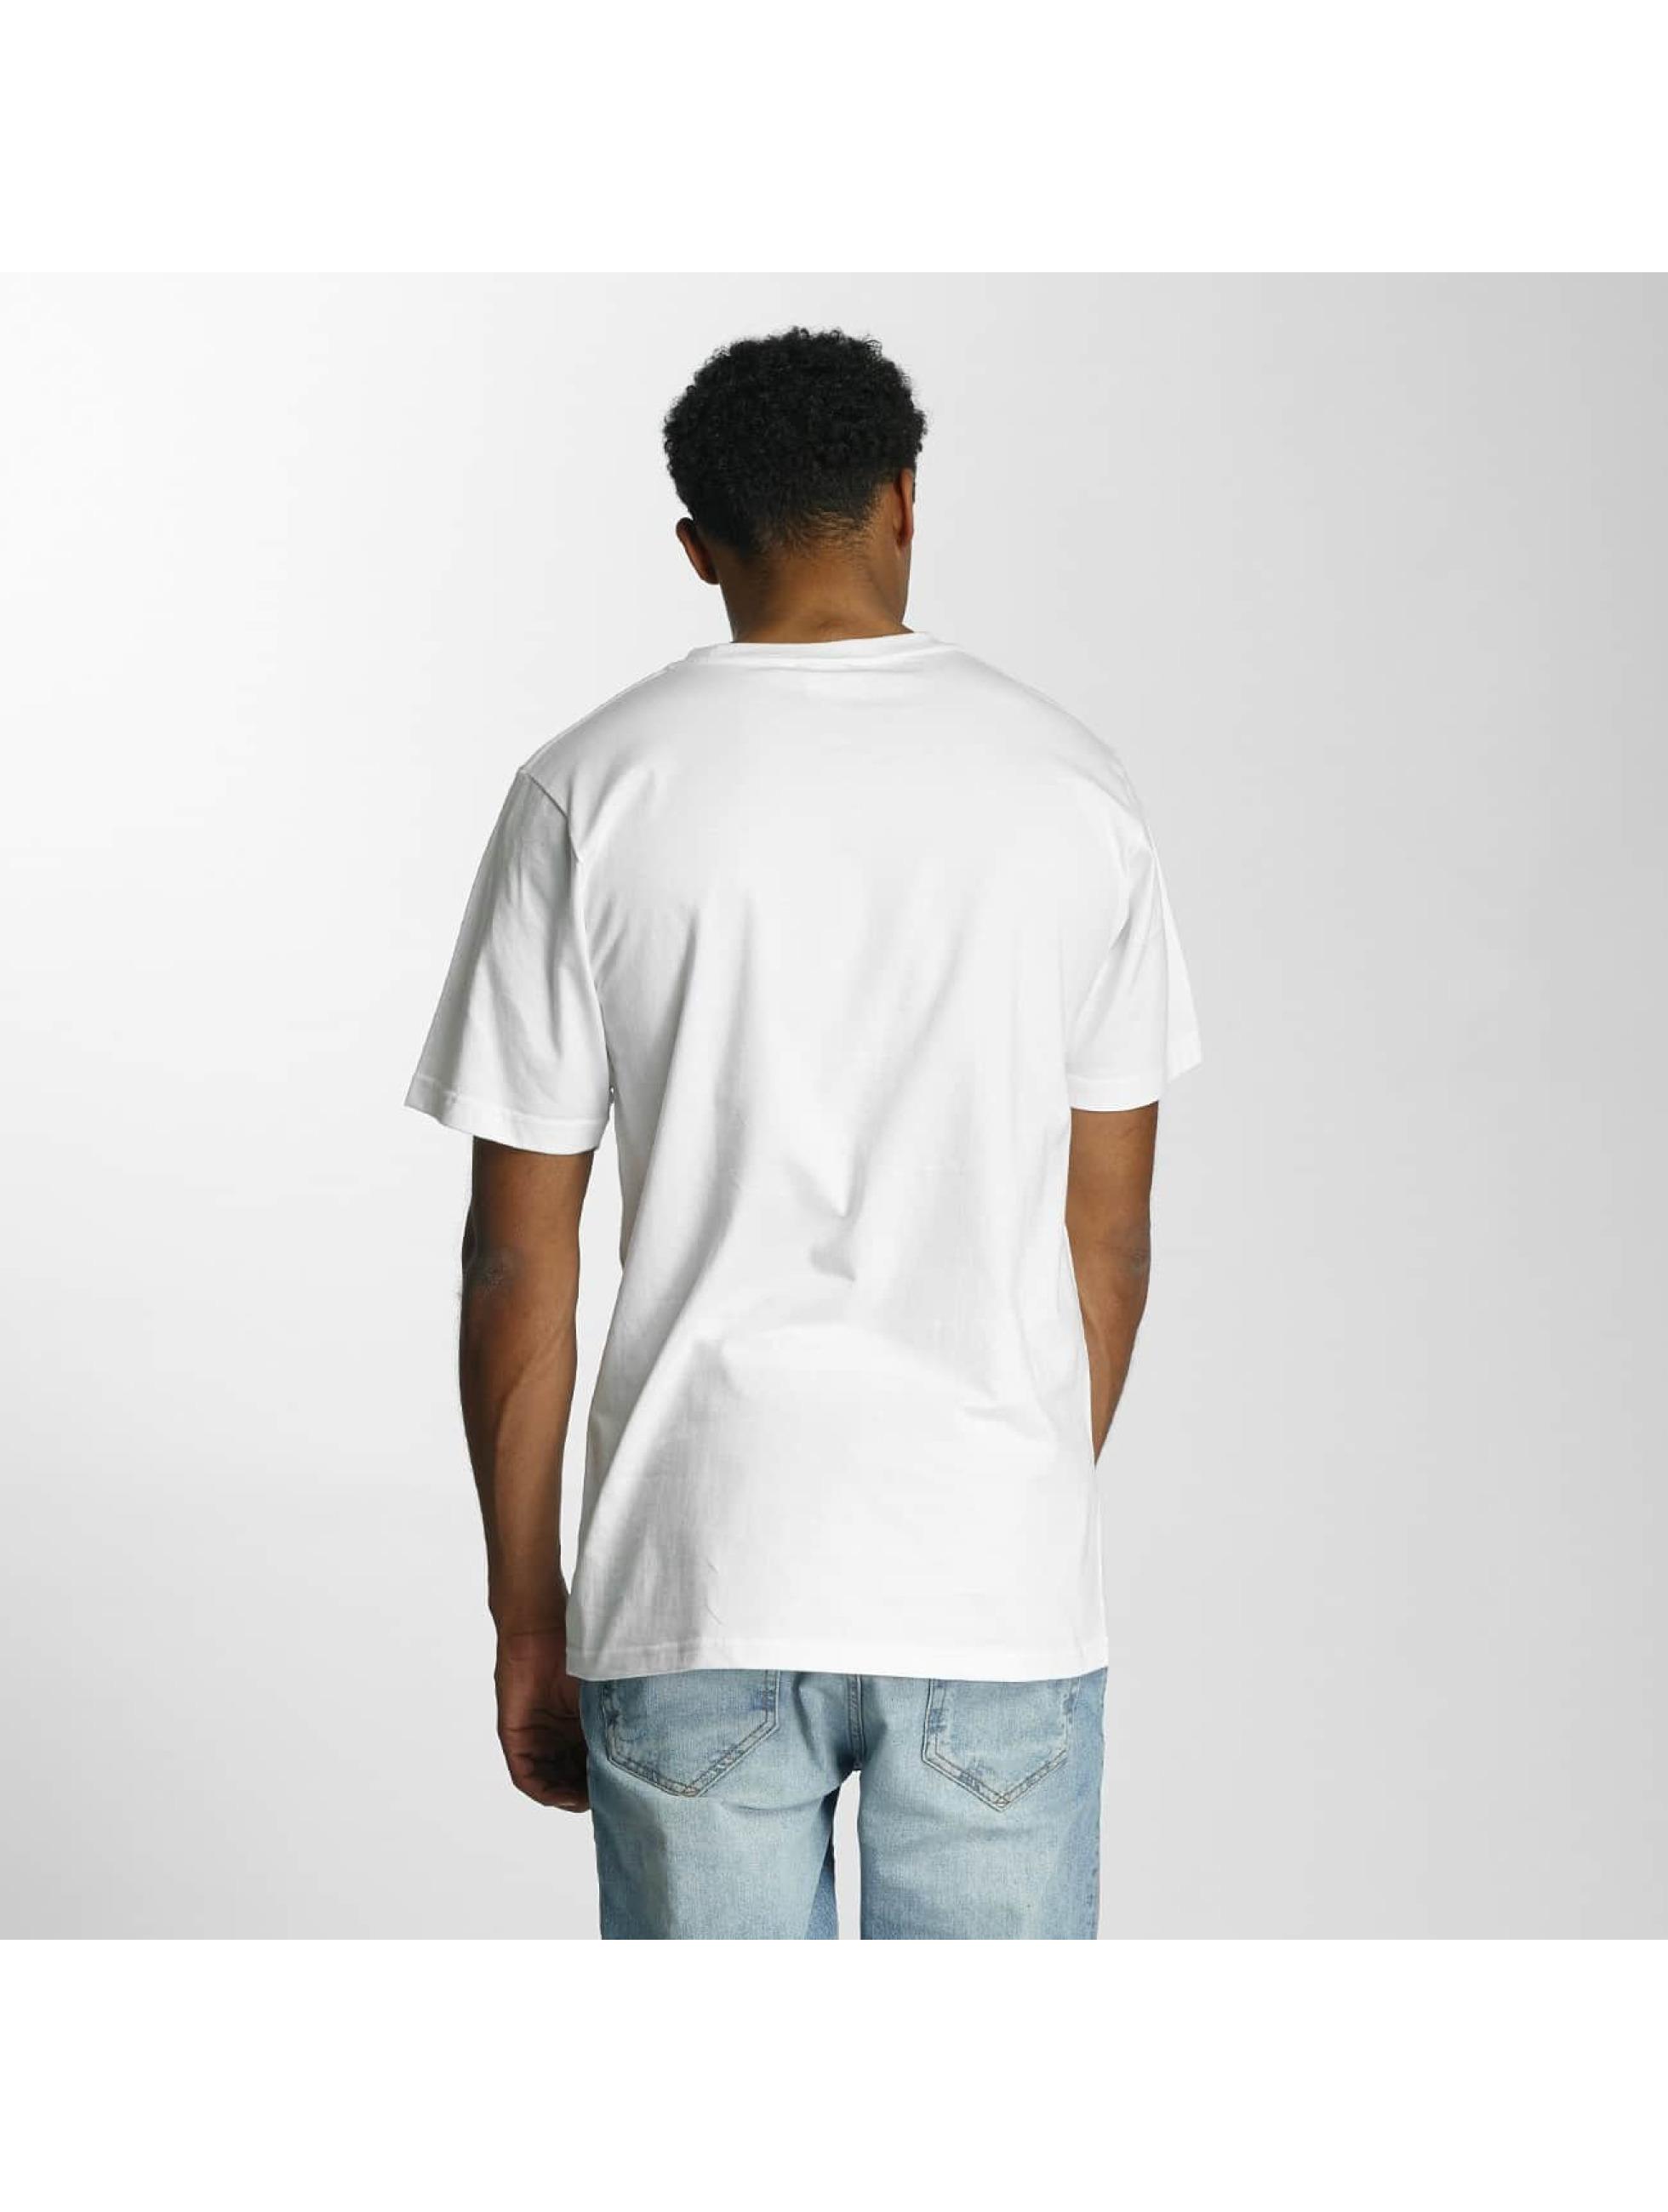 LRG T-paidat Grind valkoinen